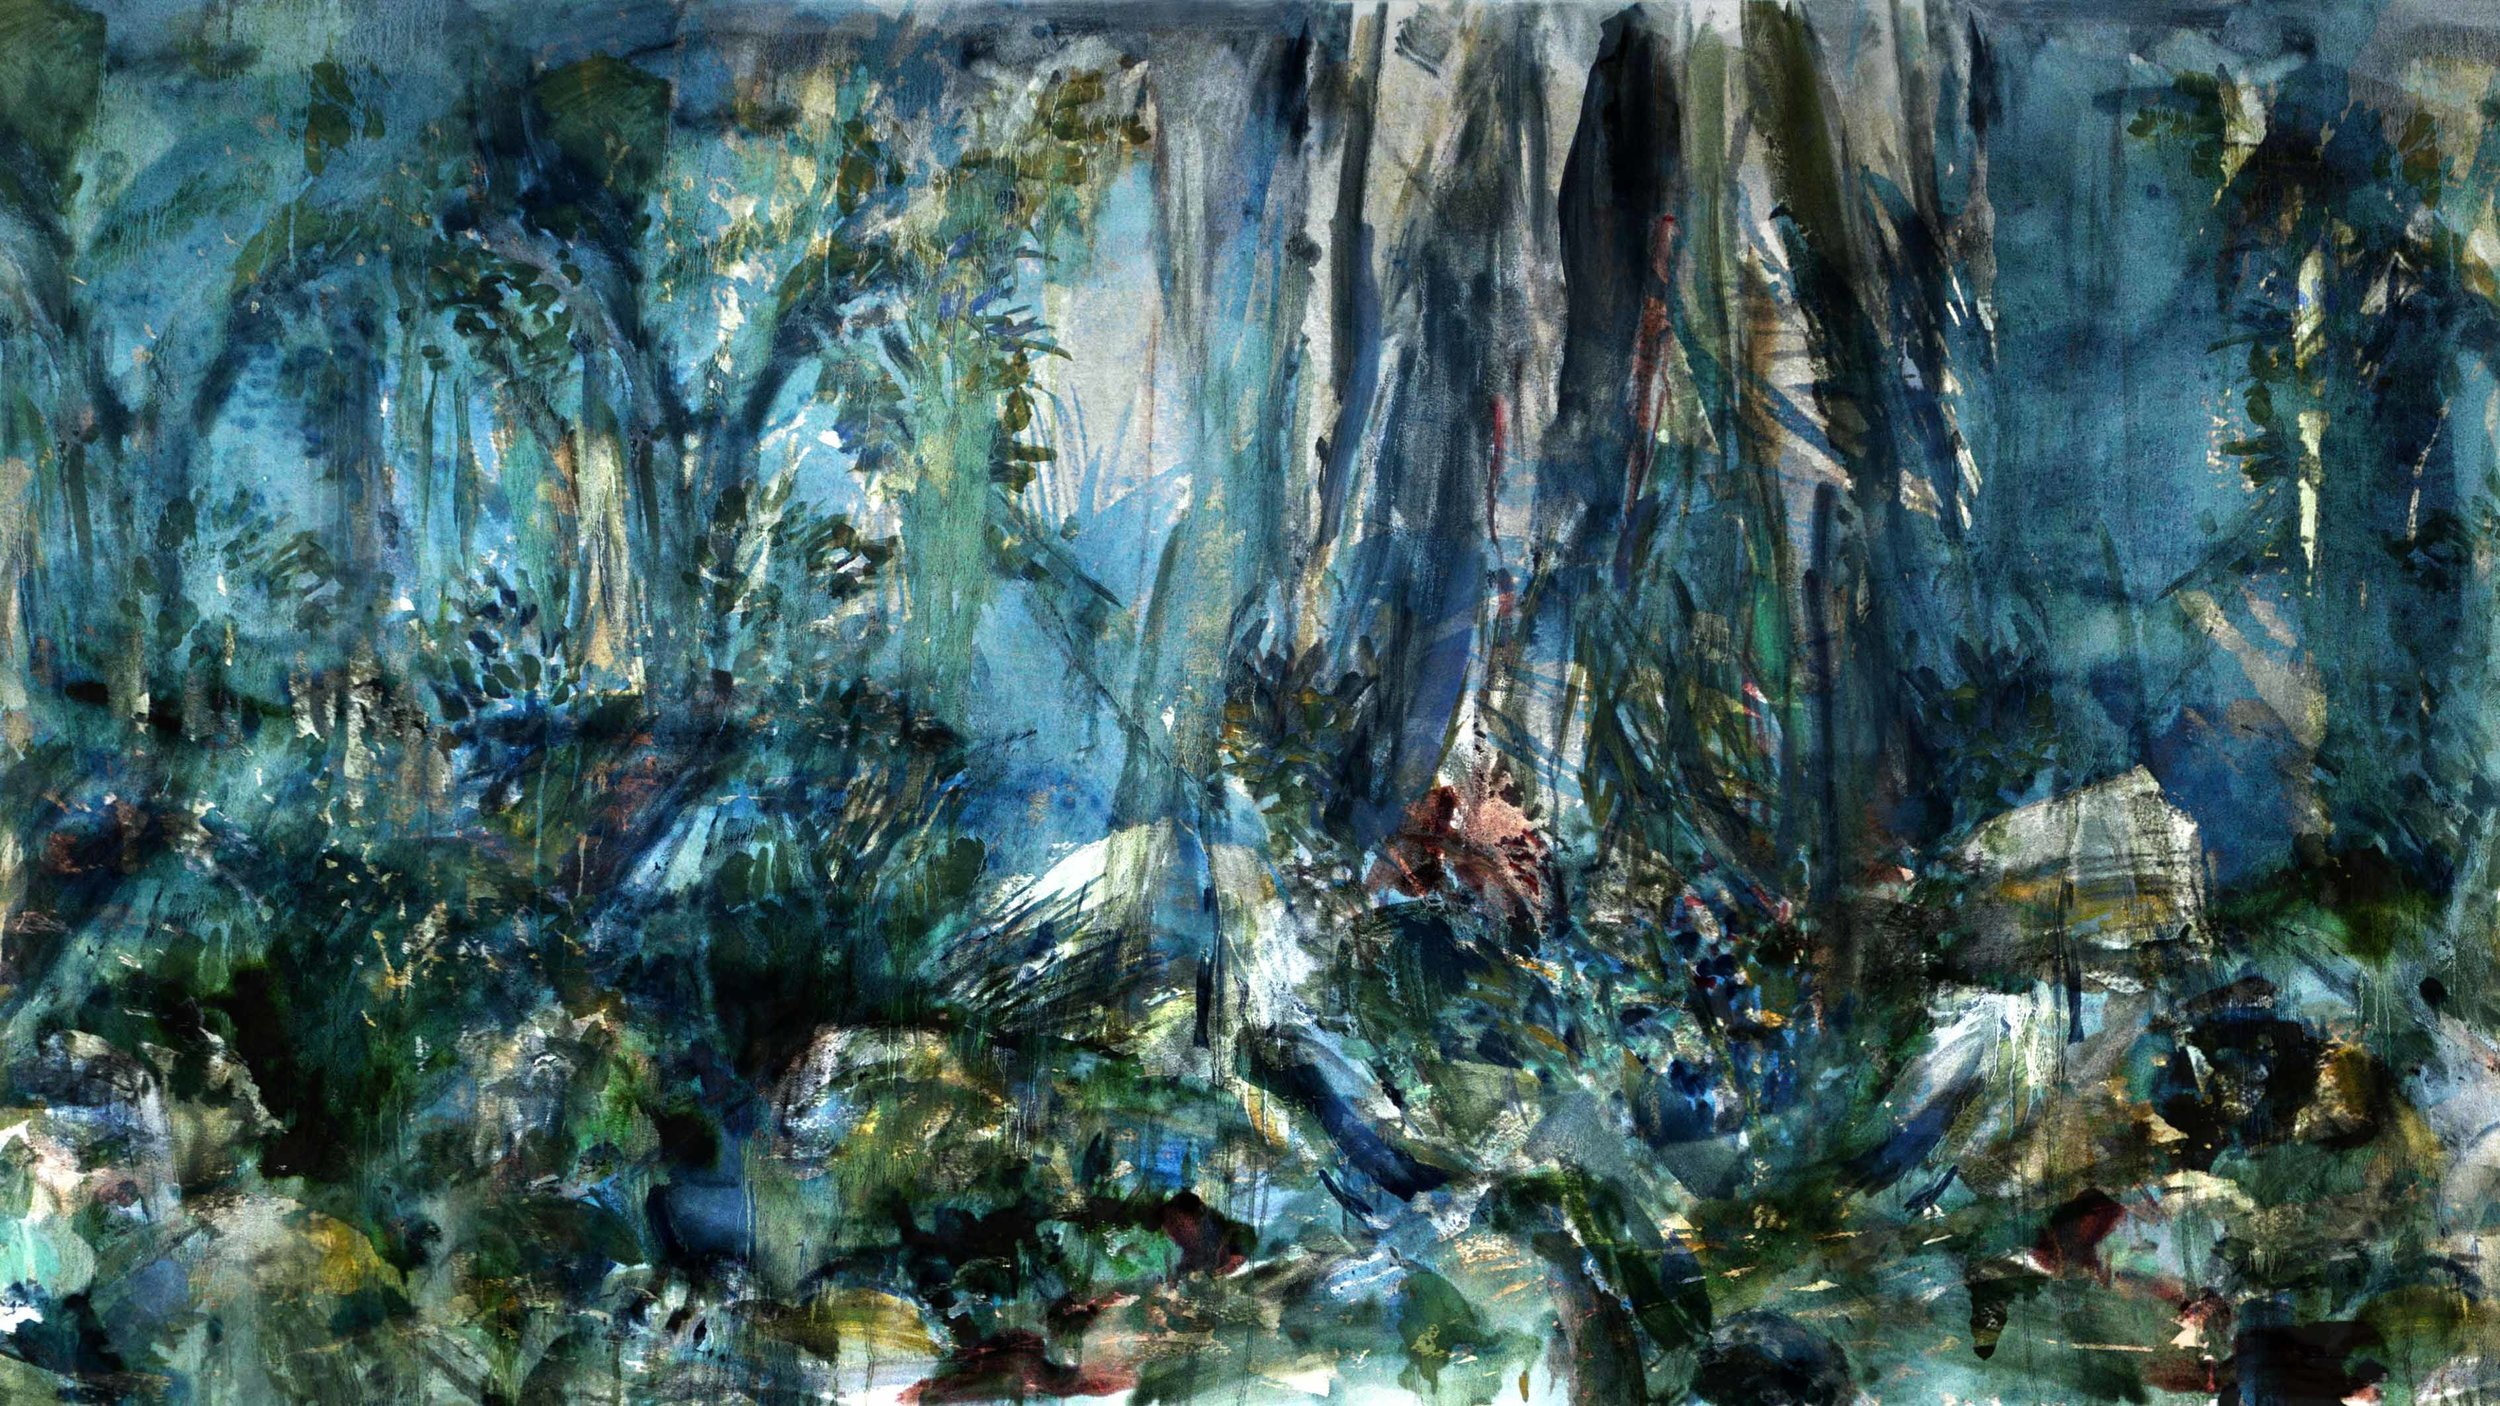 Marais 5, digital painting, dimensions variable, 2016